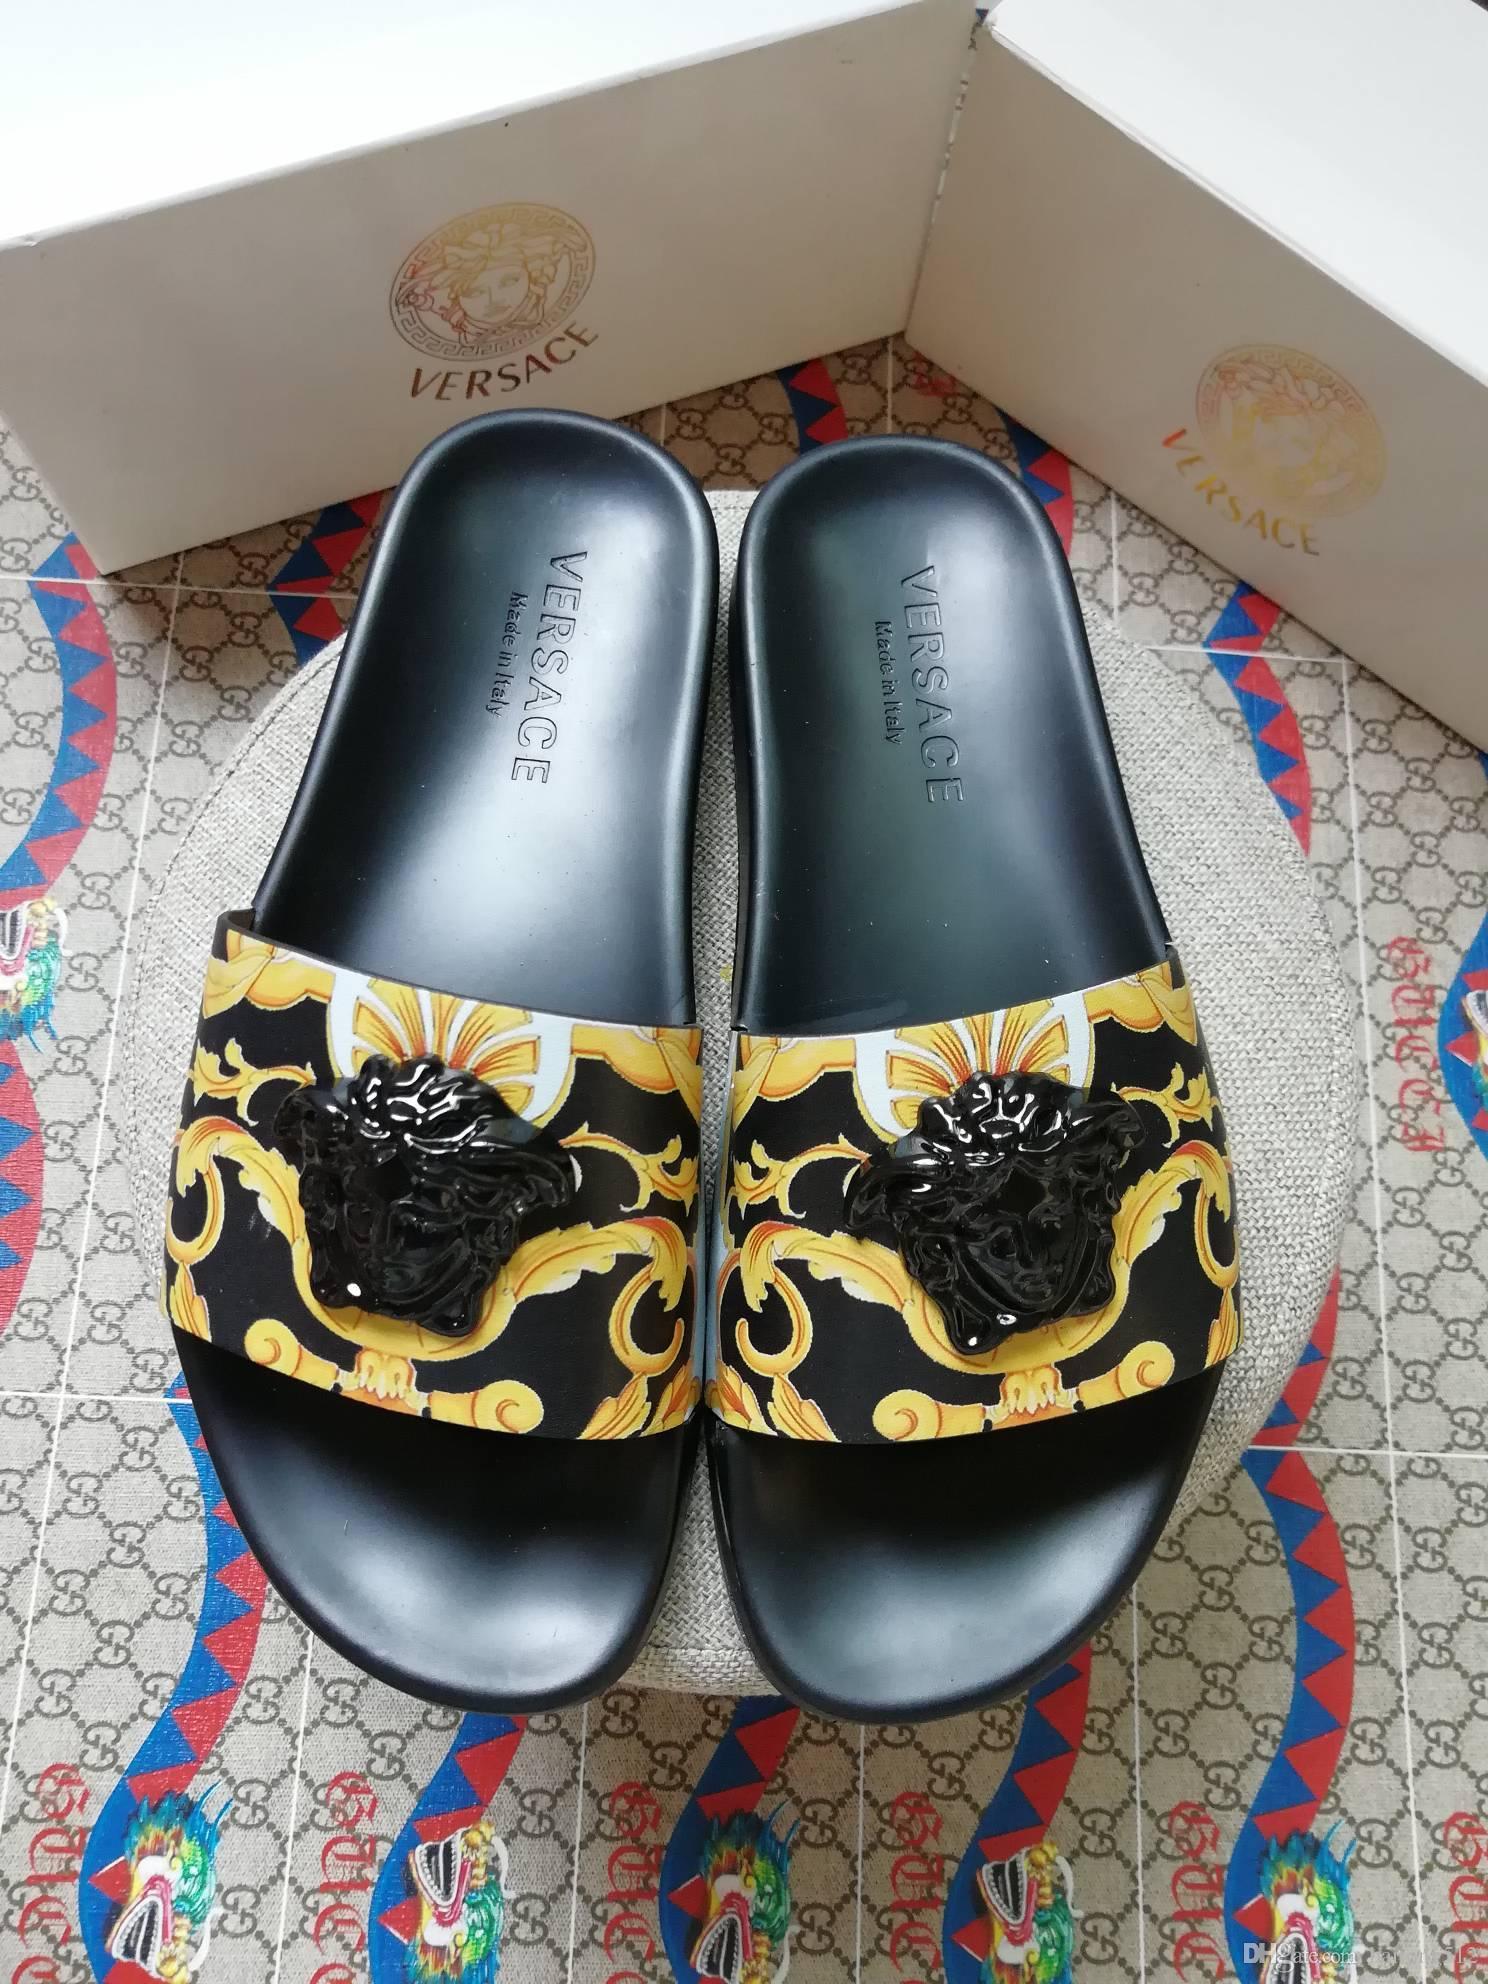 2019 Hausschuhe Herren Sandalen lässig Walking Strandschuhe Hausschuhe Massage Hausschuhe Designer flache Schuhe Sommer Herren ShoeBox + Staubbeutel